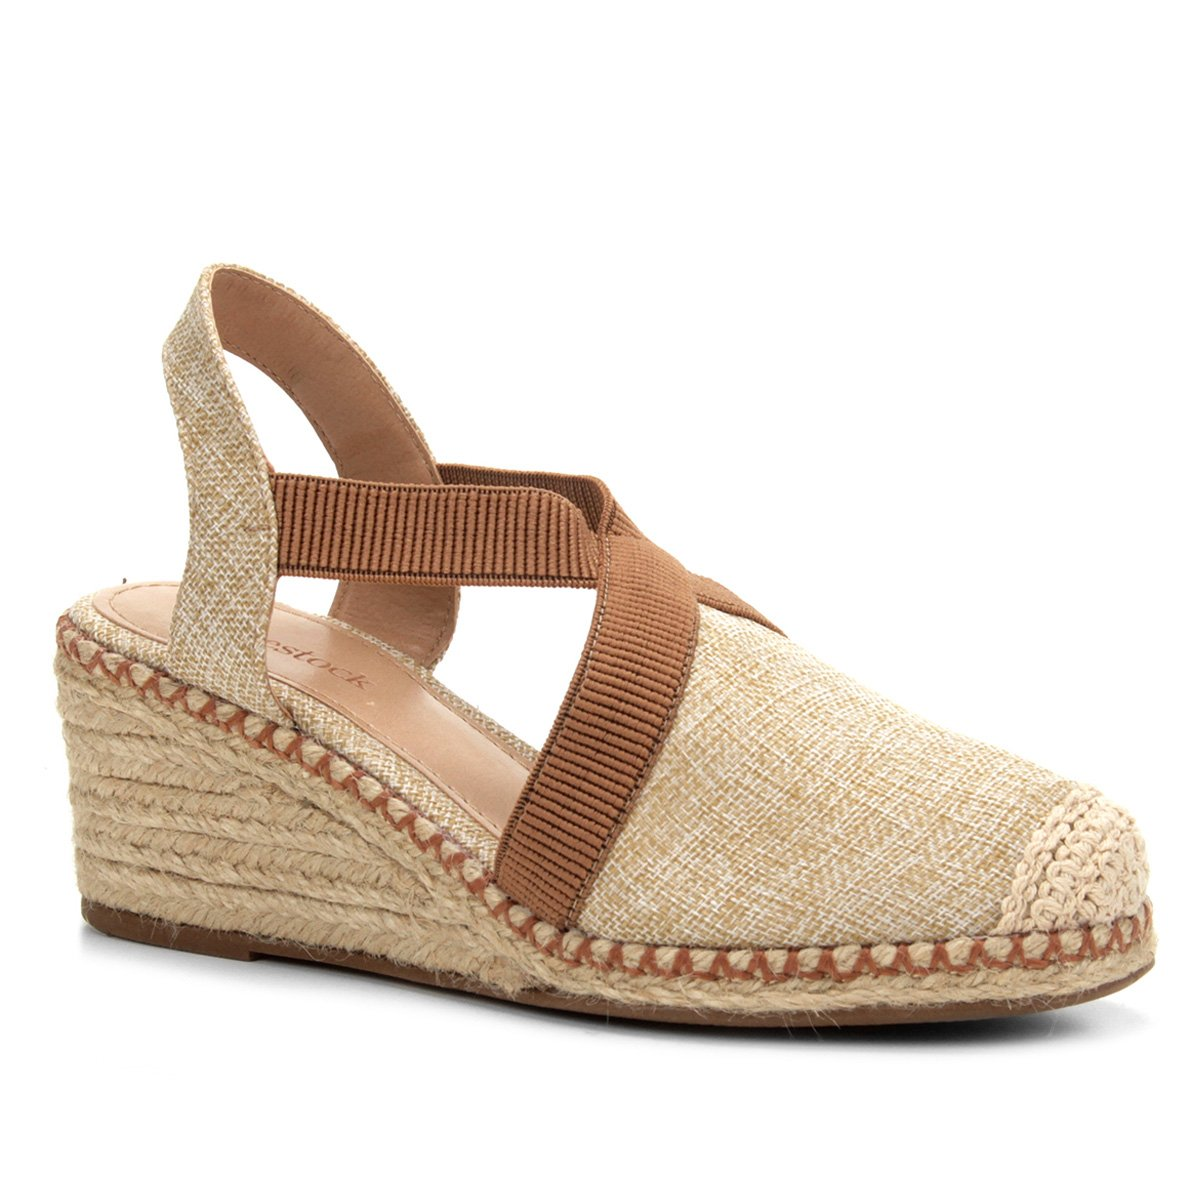 830af8cf9 Sandália Anabela Shoestock Elástico Corda Feminina - Caramelo | Shoestock